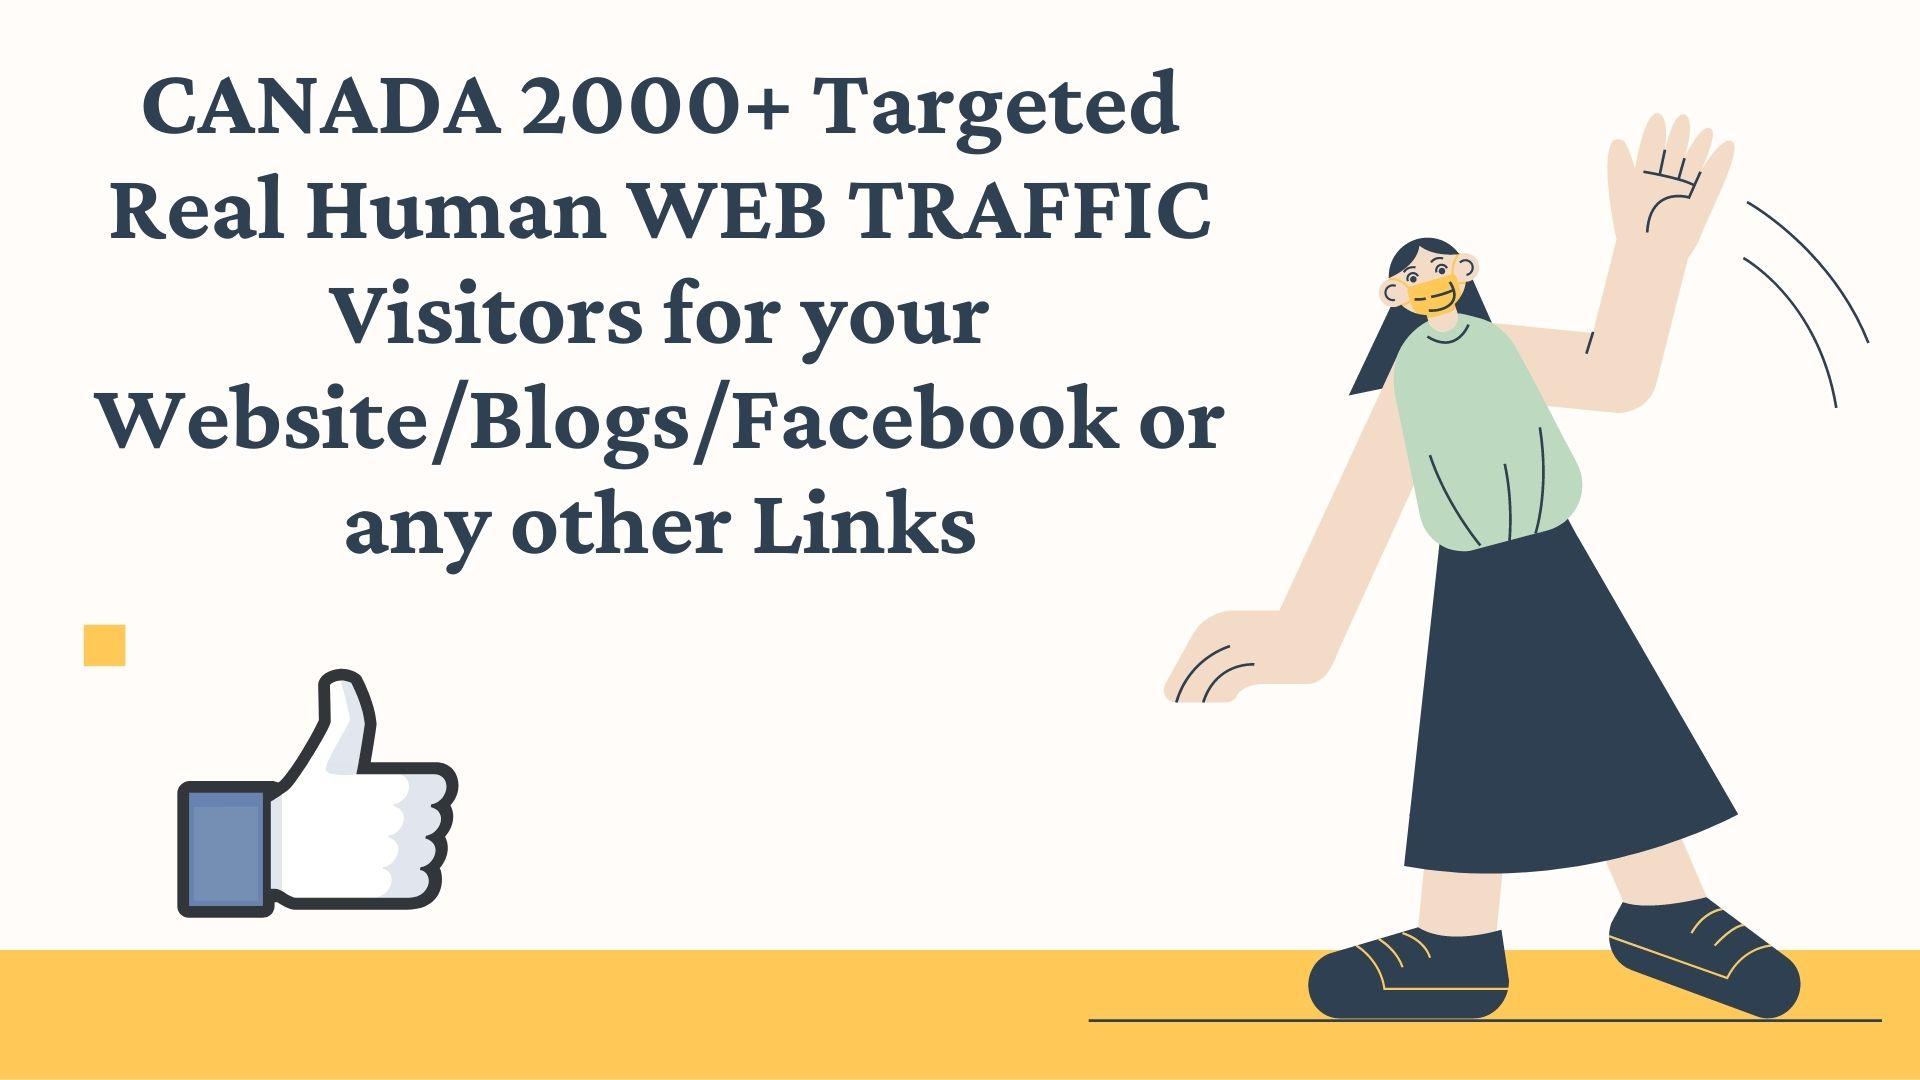 CANADA 2000+ Targeted Real Human WEB TRAFFIC